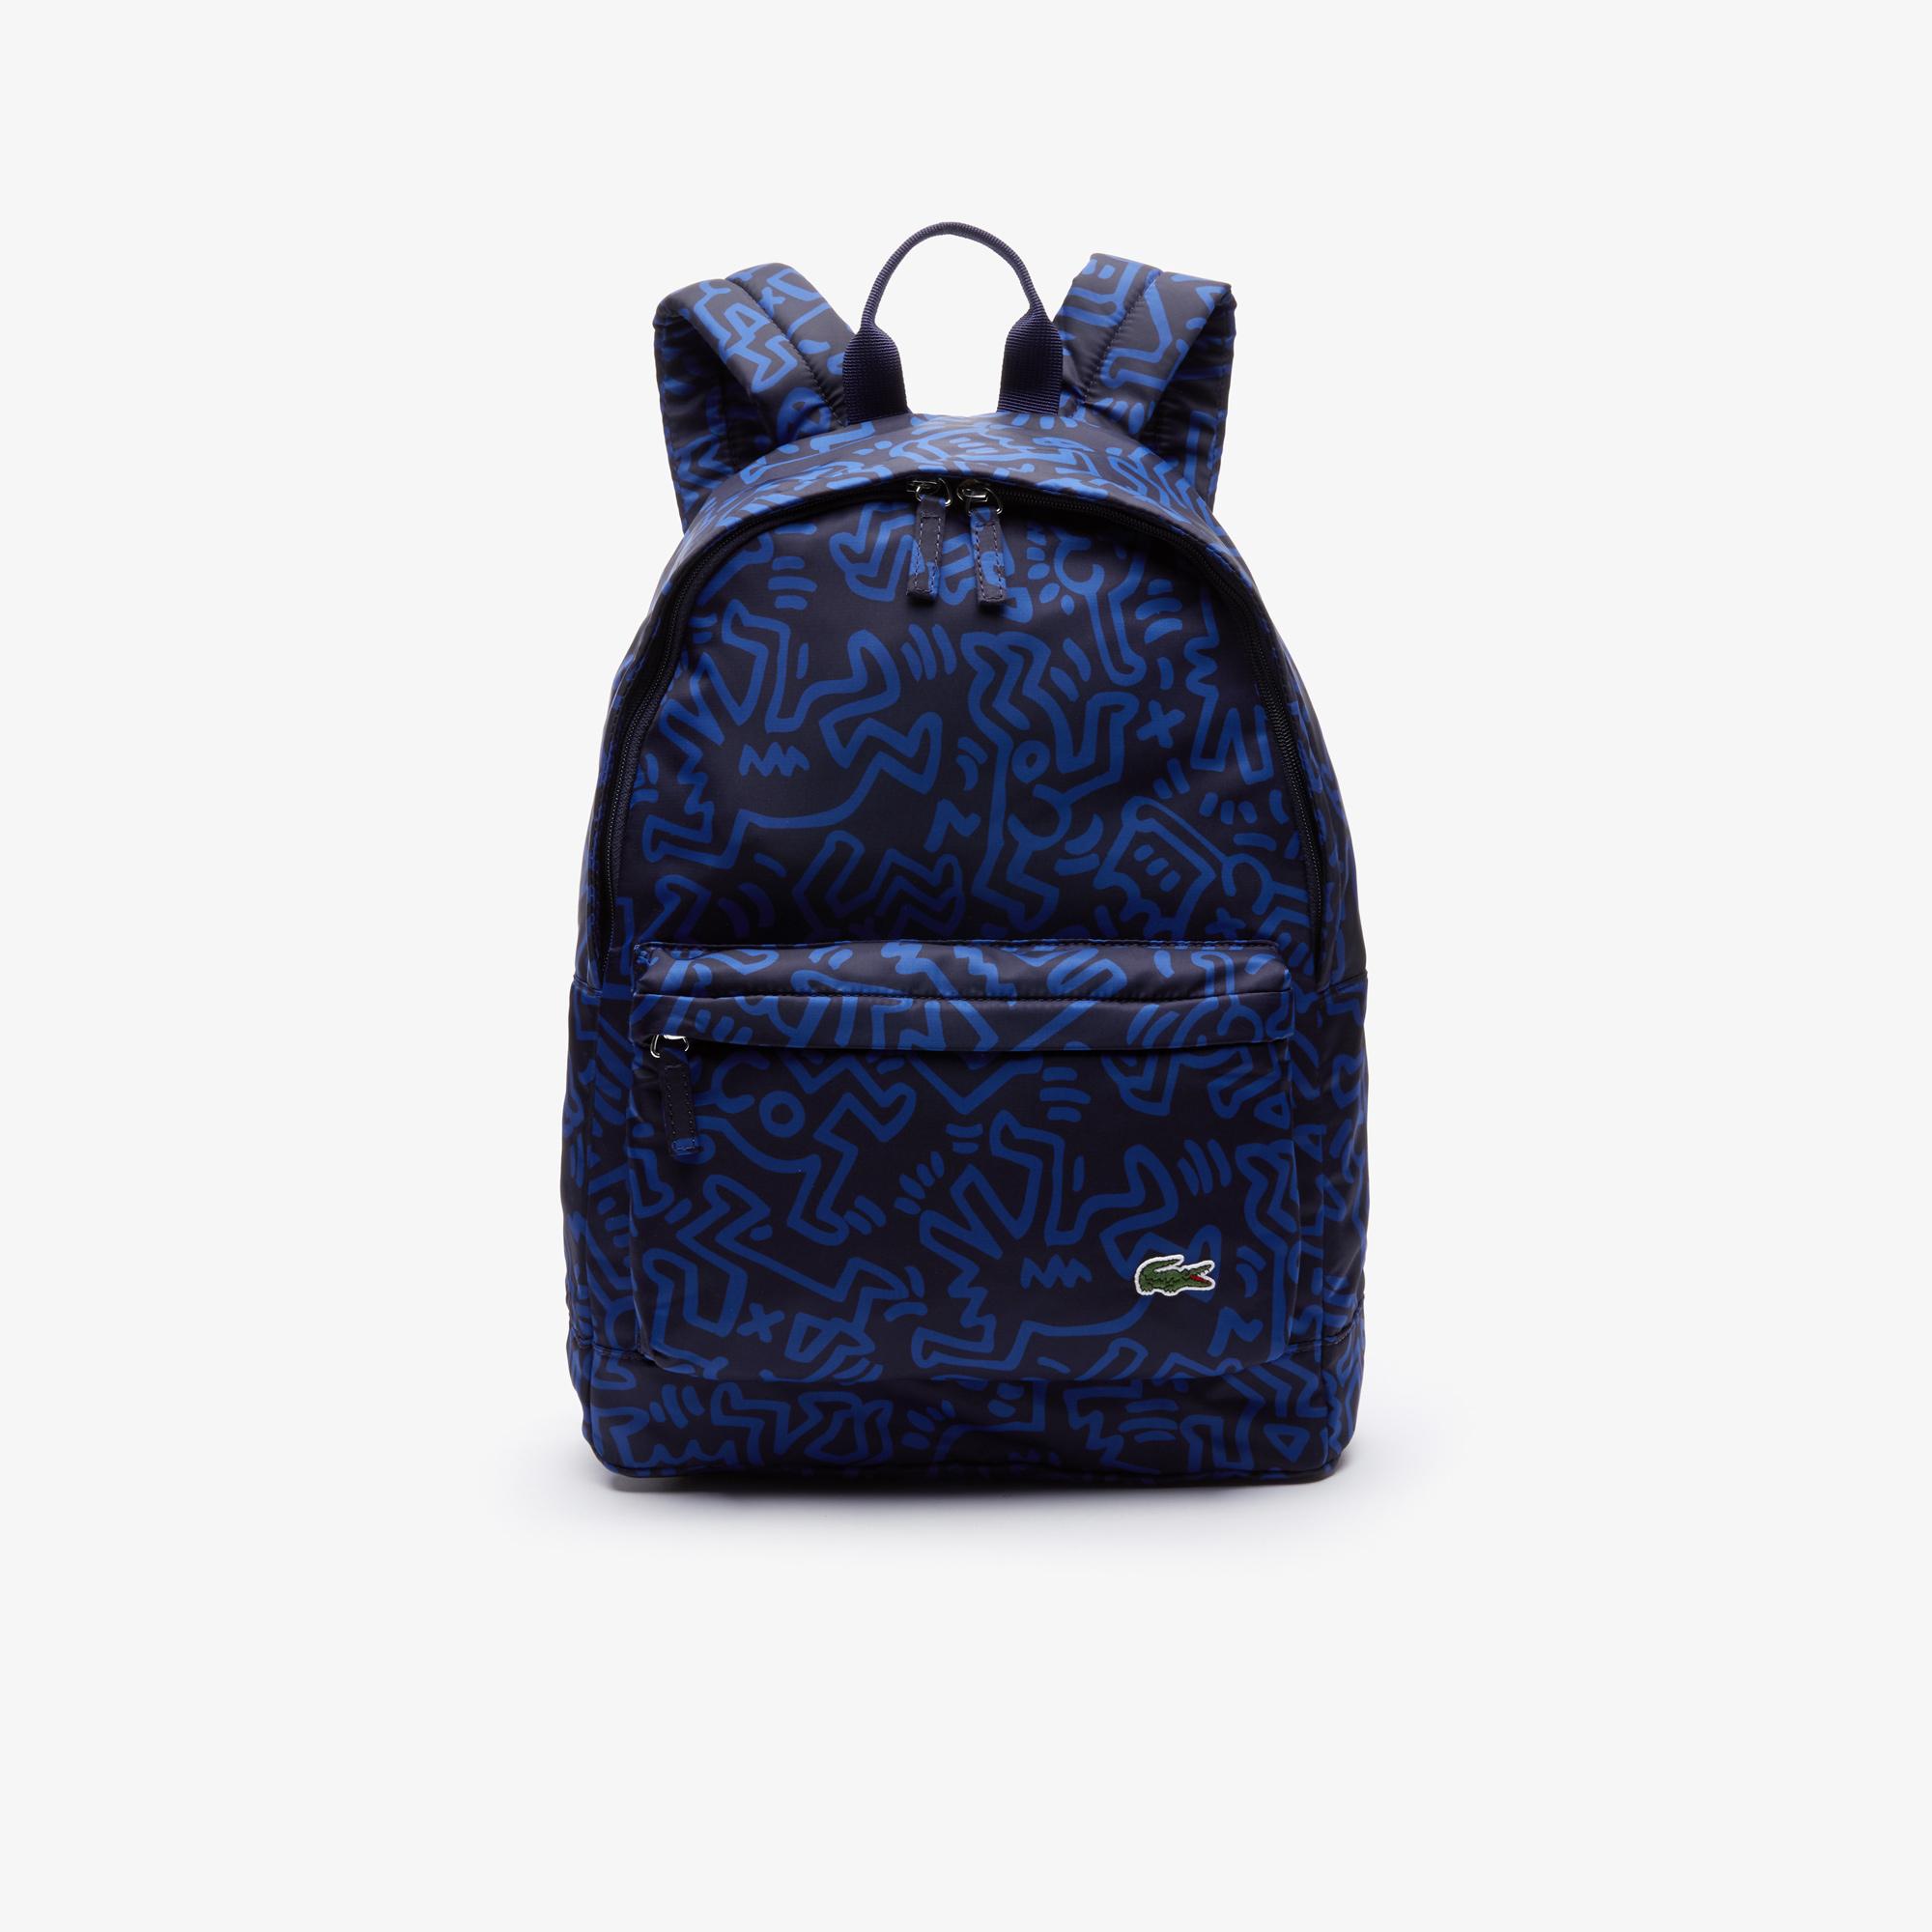 Keith Haring Backpack $178